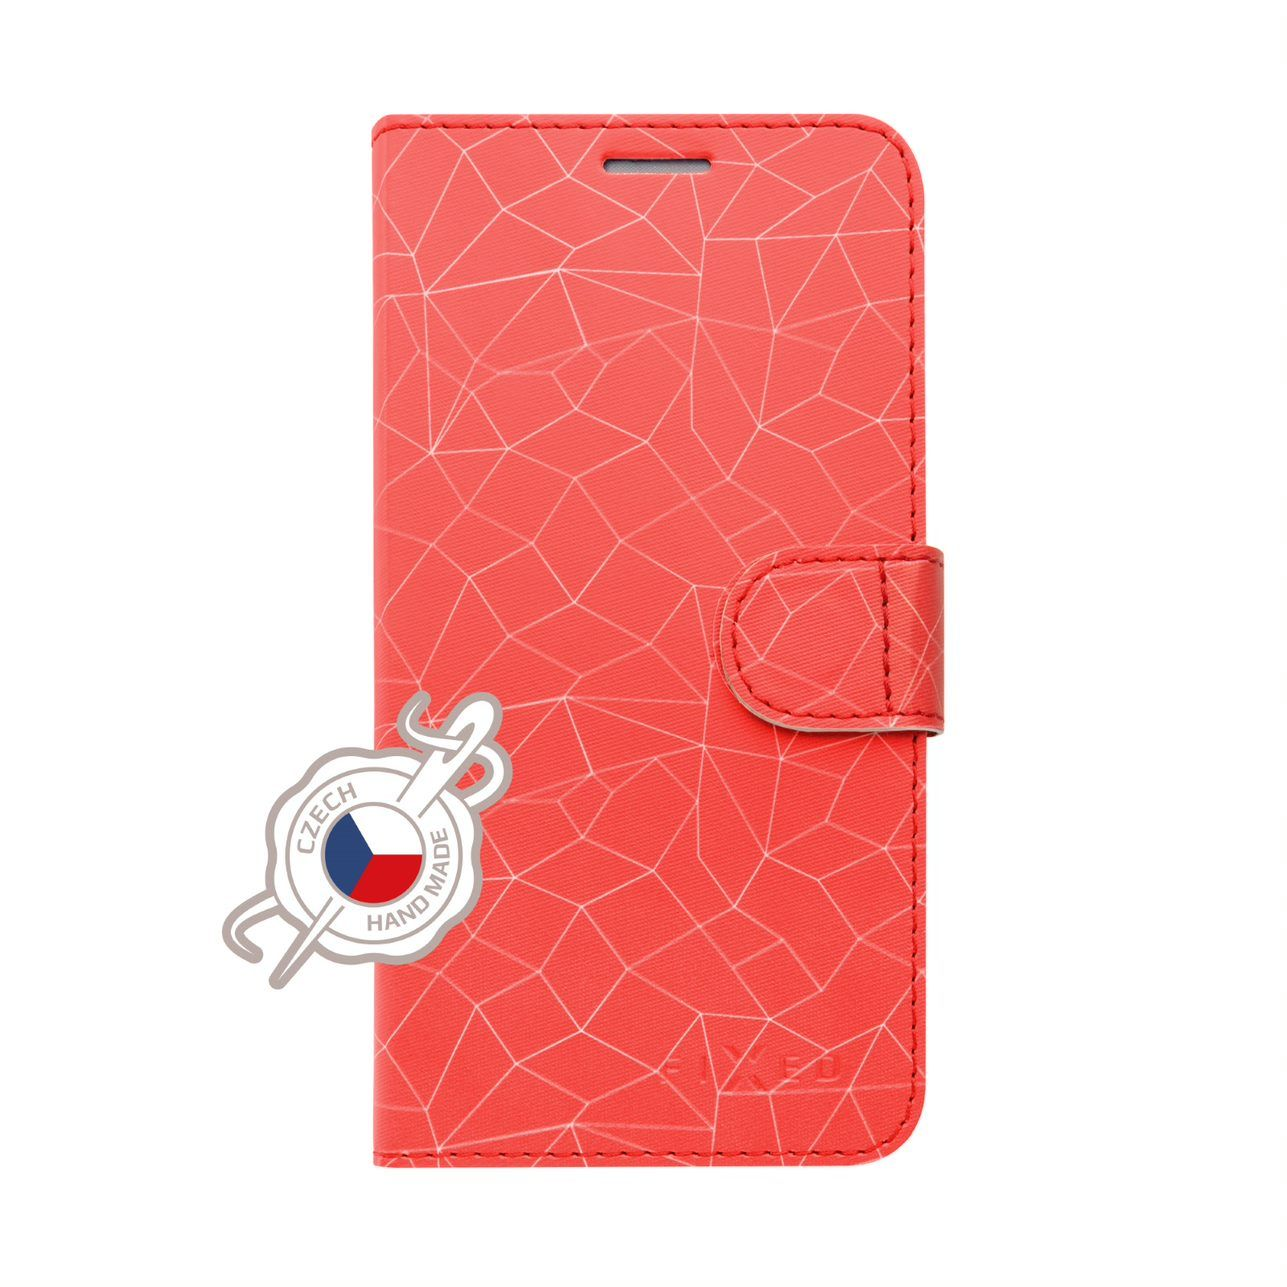 Pouzdro typu kniha FIXED FIT pro Xiaomi Redmi Note 7/7 Pro, motiv Red Mesh